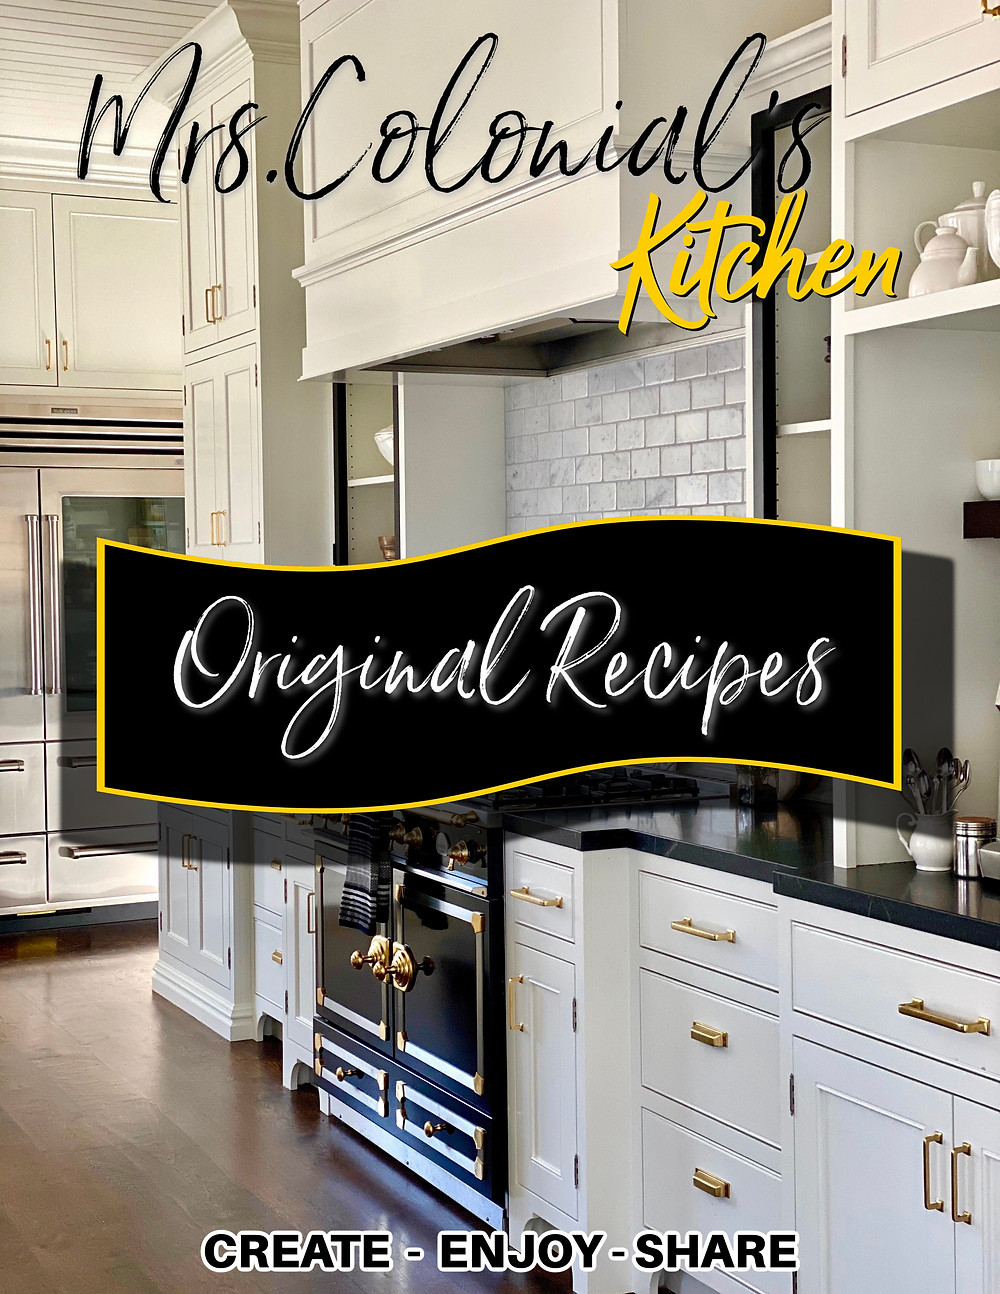 Mrs. Colonial's Kitchen recipes at RockHavenFarm.com